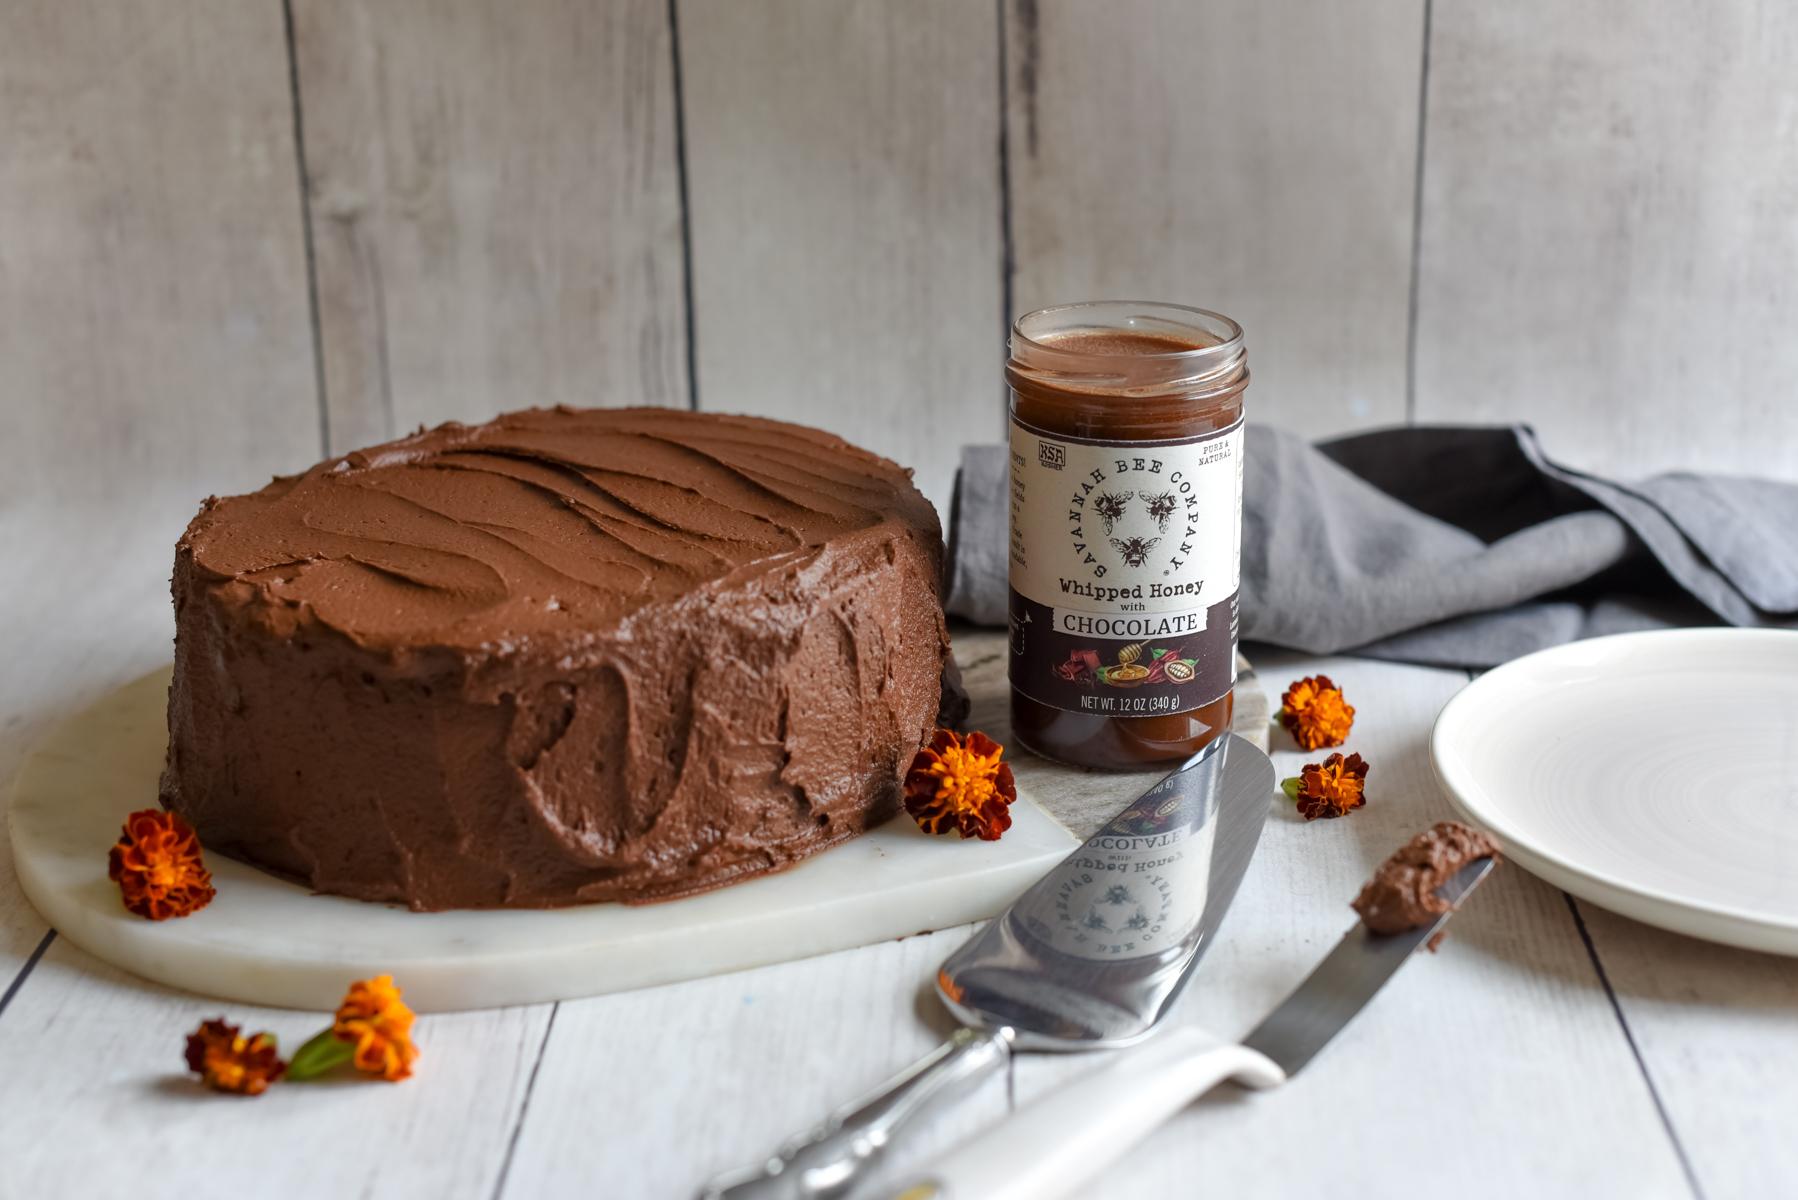 chocolate-whipped-honey-cake-savannah-bee-company-4.jpg